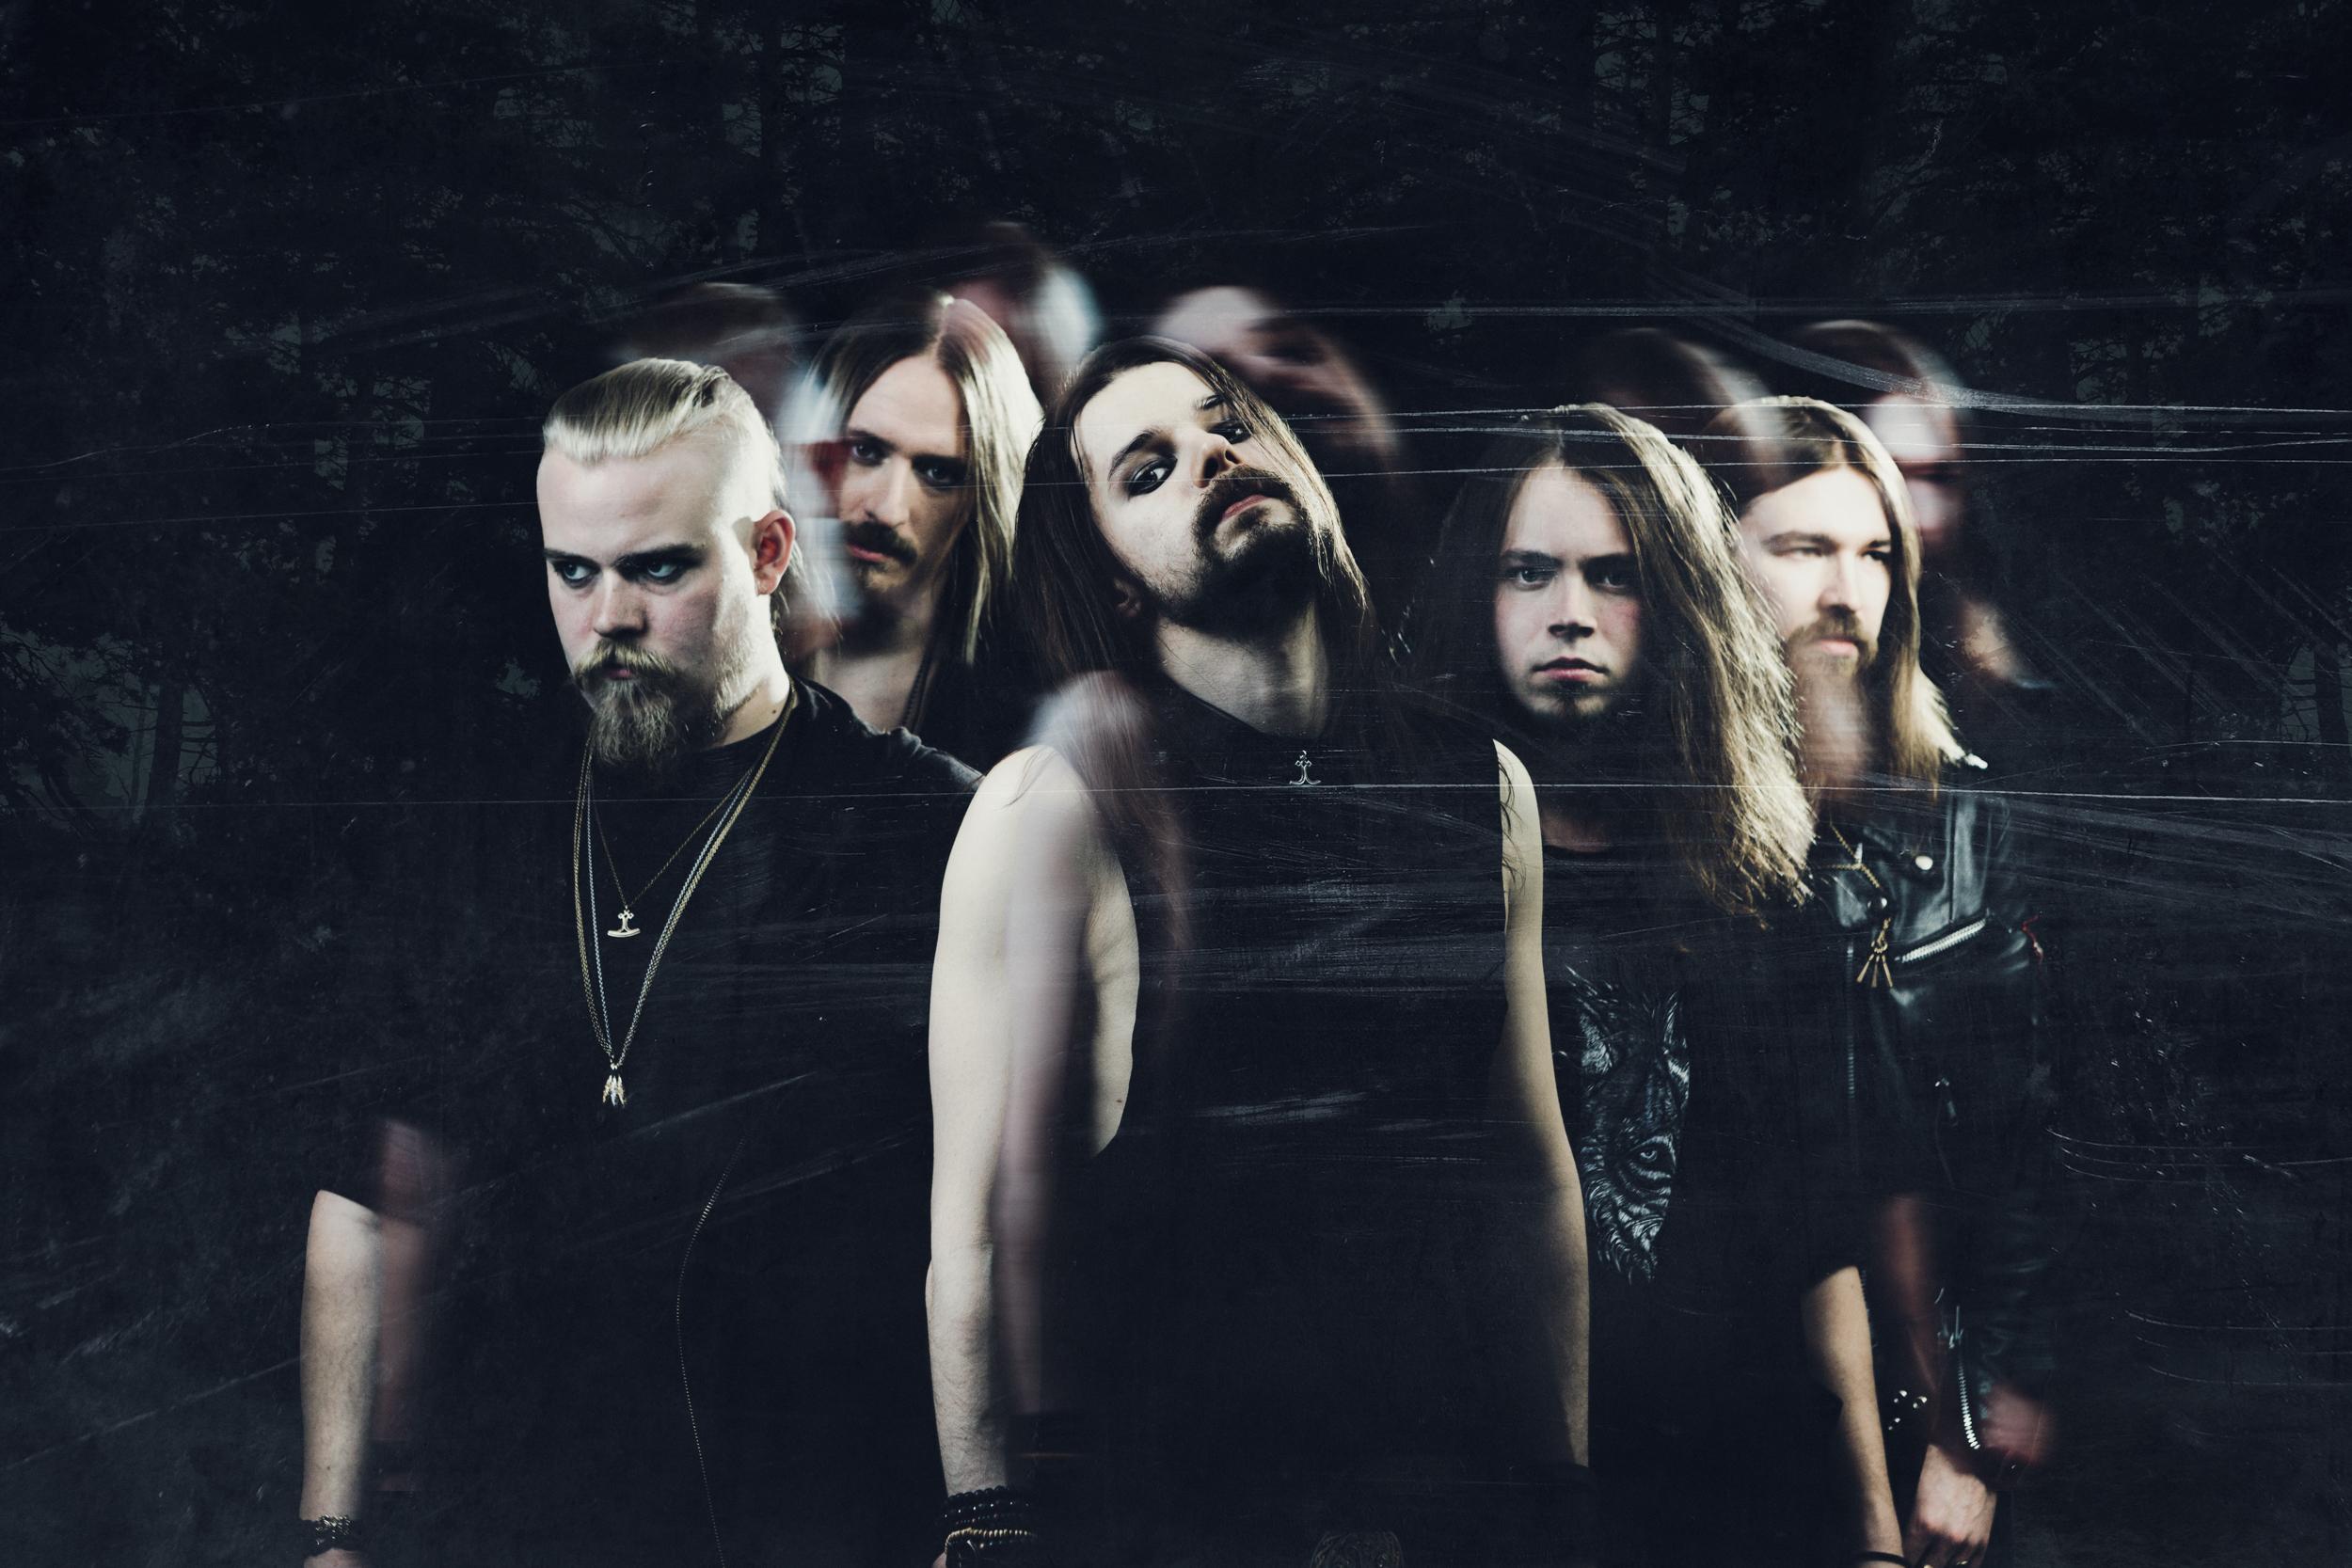 Valkeat_Band_c_Petri_Anttila_web.jpg